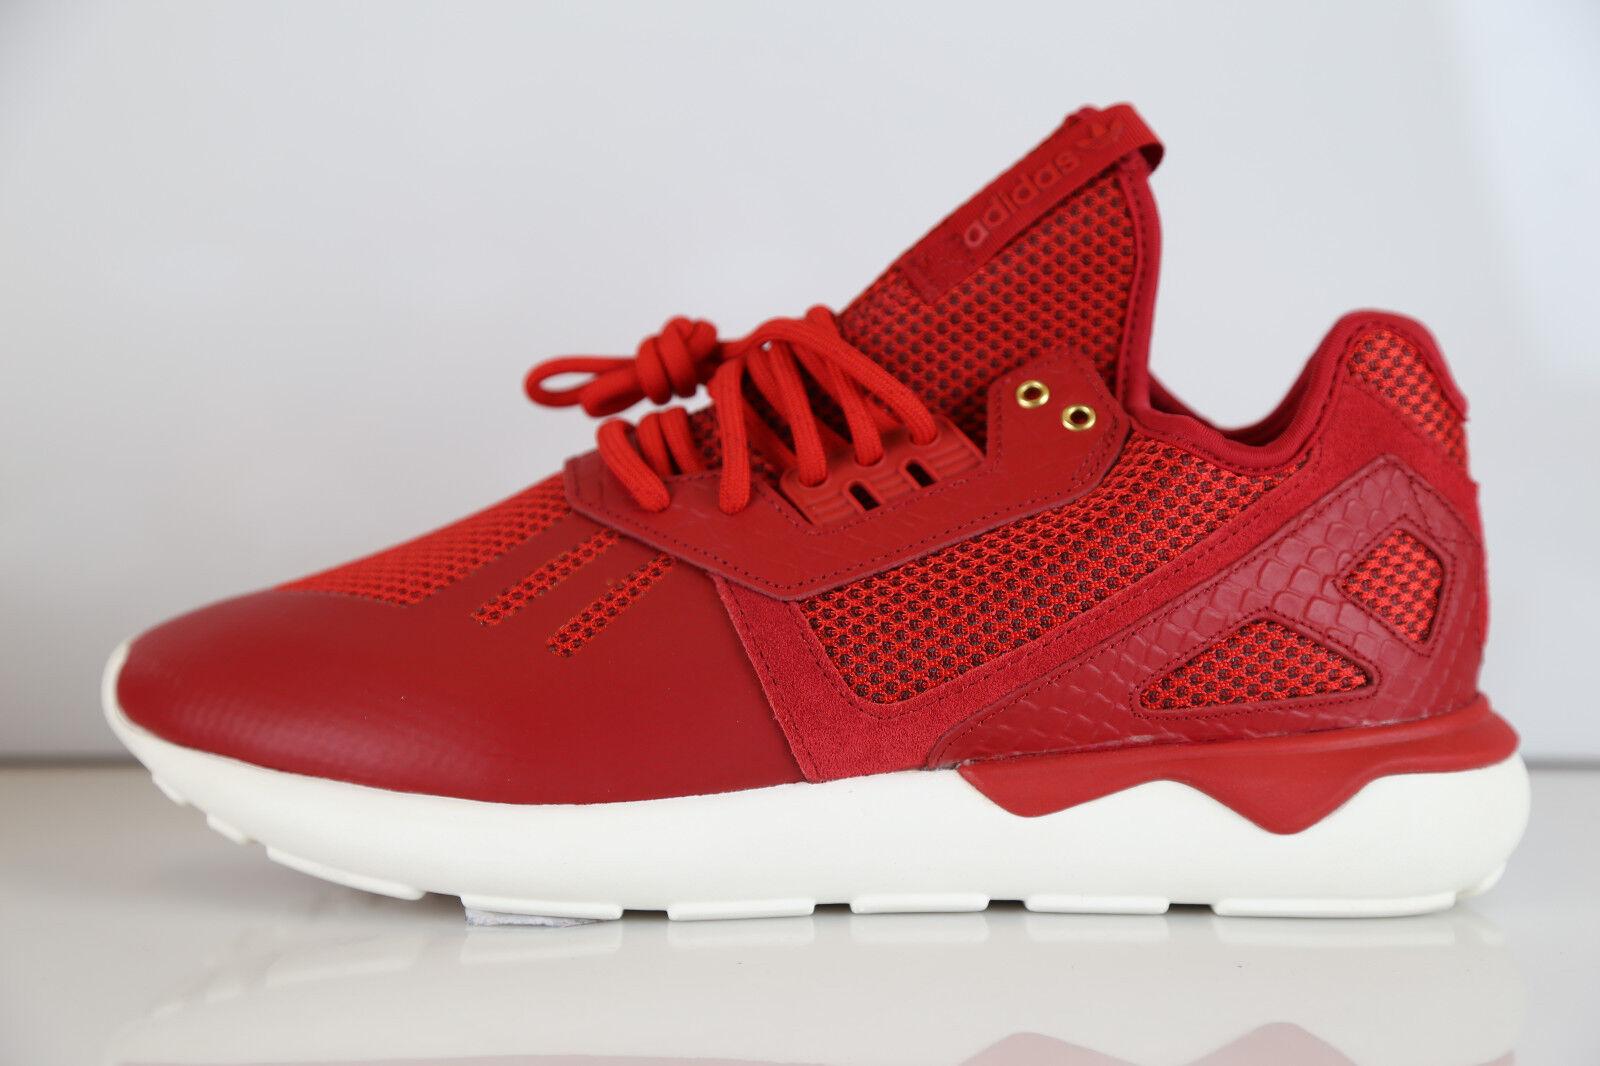 Adidas Tubular Runner CNY Chinese New Year Red AQ2549 8-12 ultra originals boost